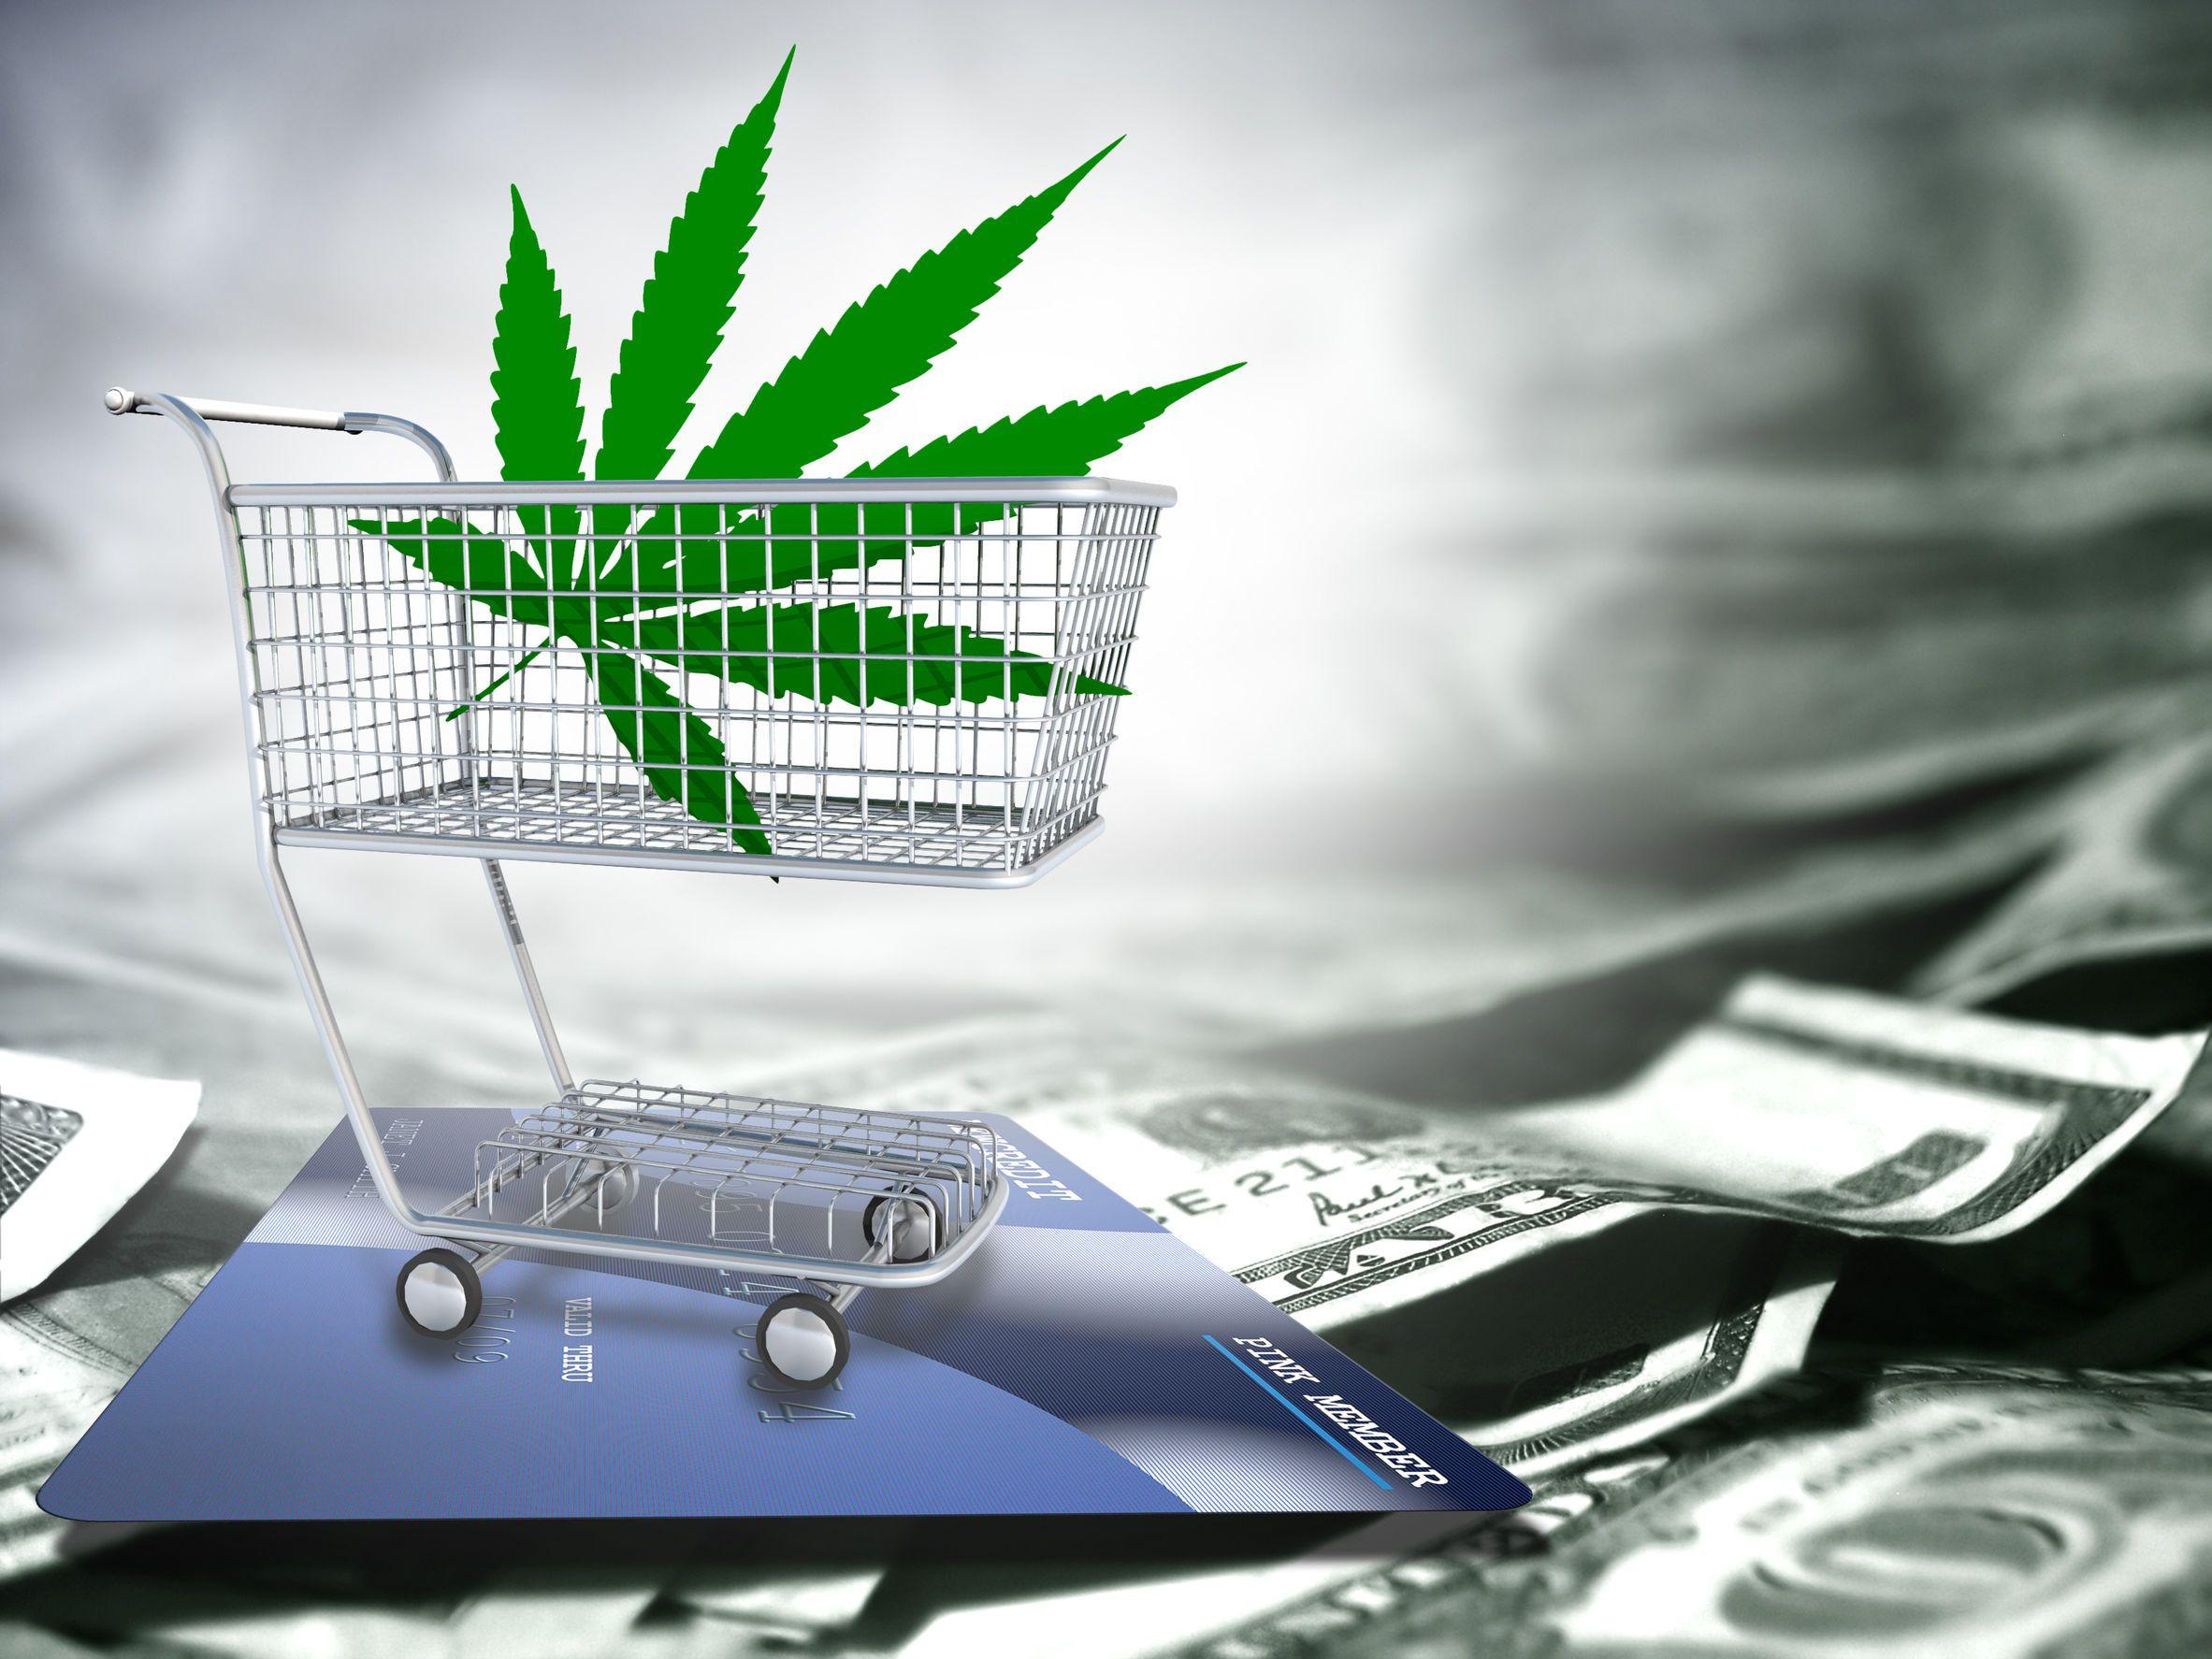 , Major Canadian supermarket chain Loblaw plans cannabis sales